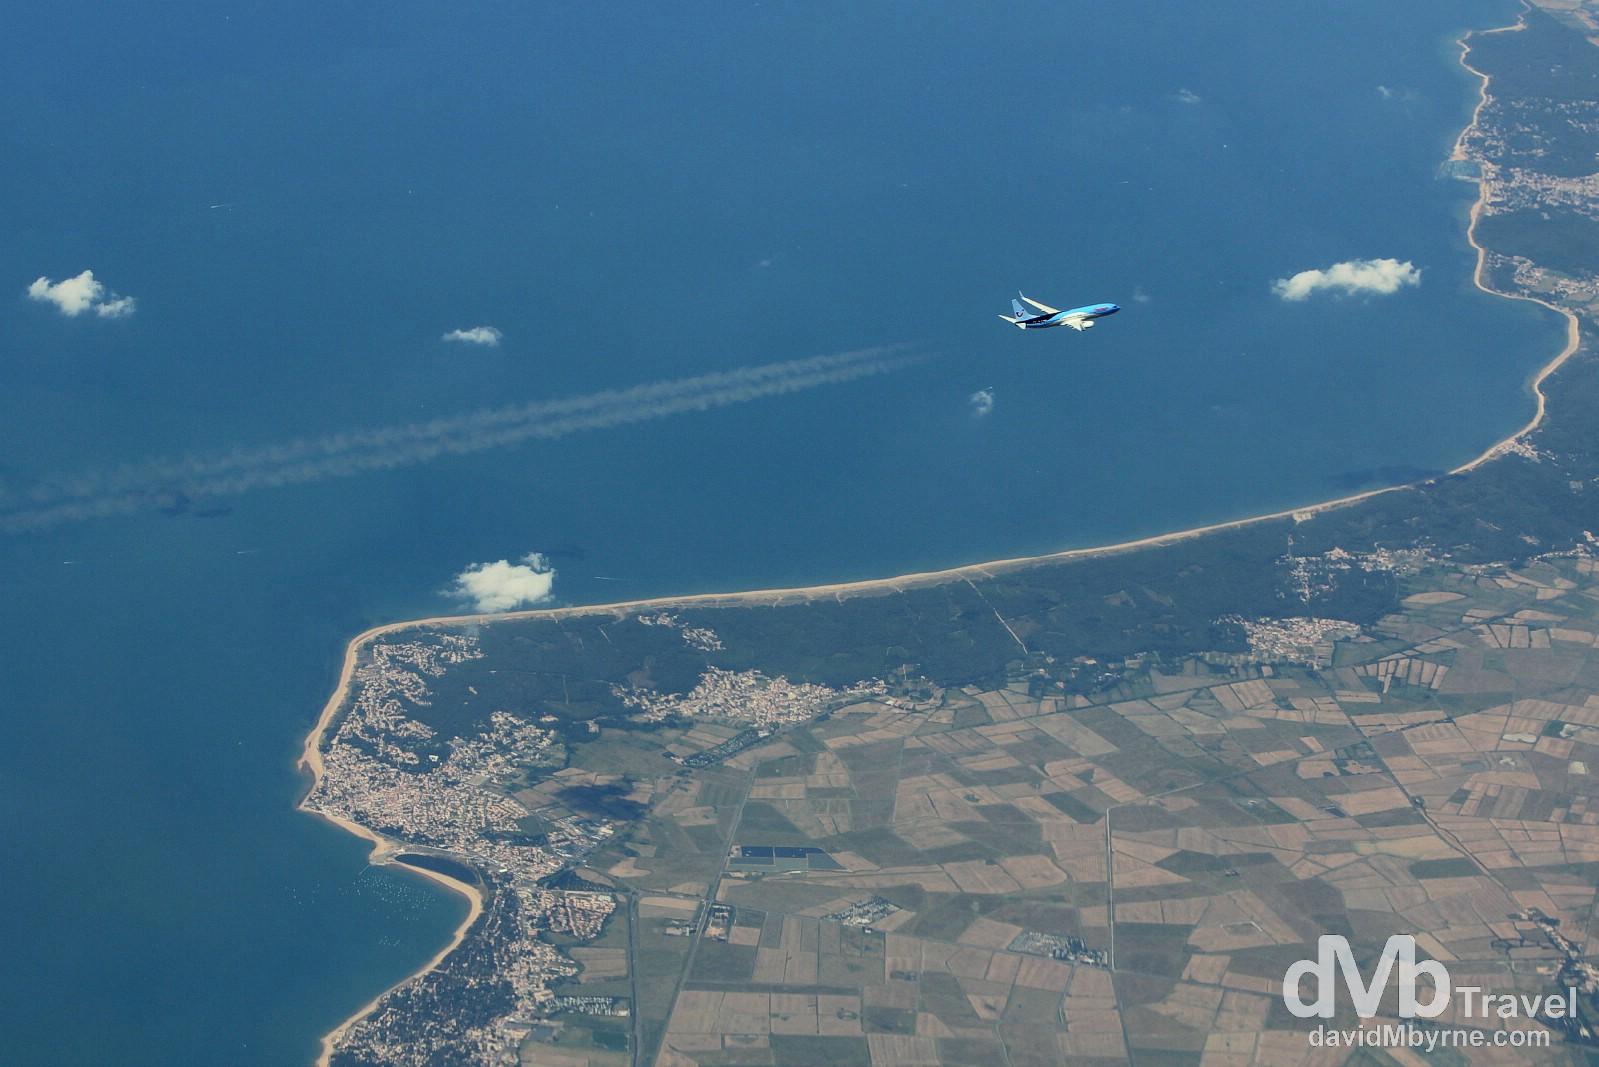 As seen from Ryanair flight FR6874 en route from Barcelona's El Prat Airport to Dublin, Ireland. June 19th, 2014.